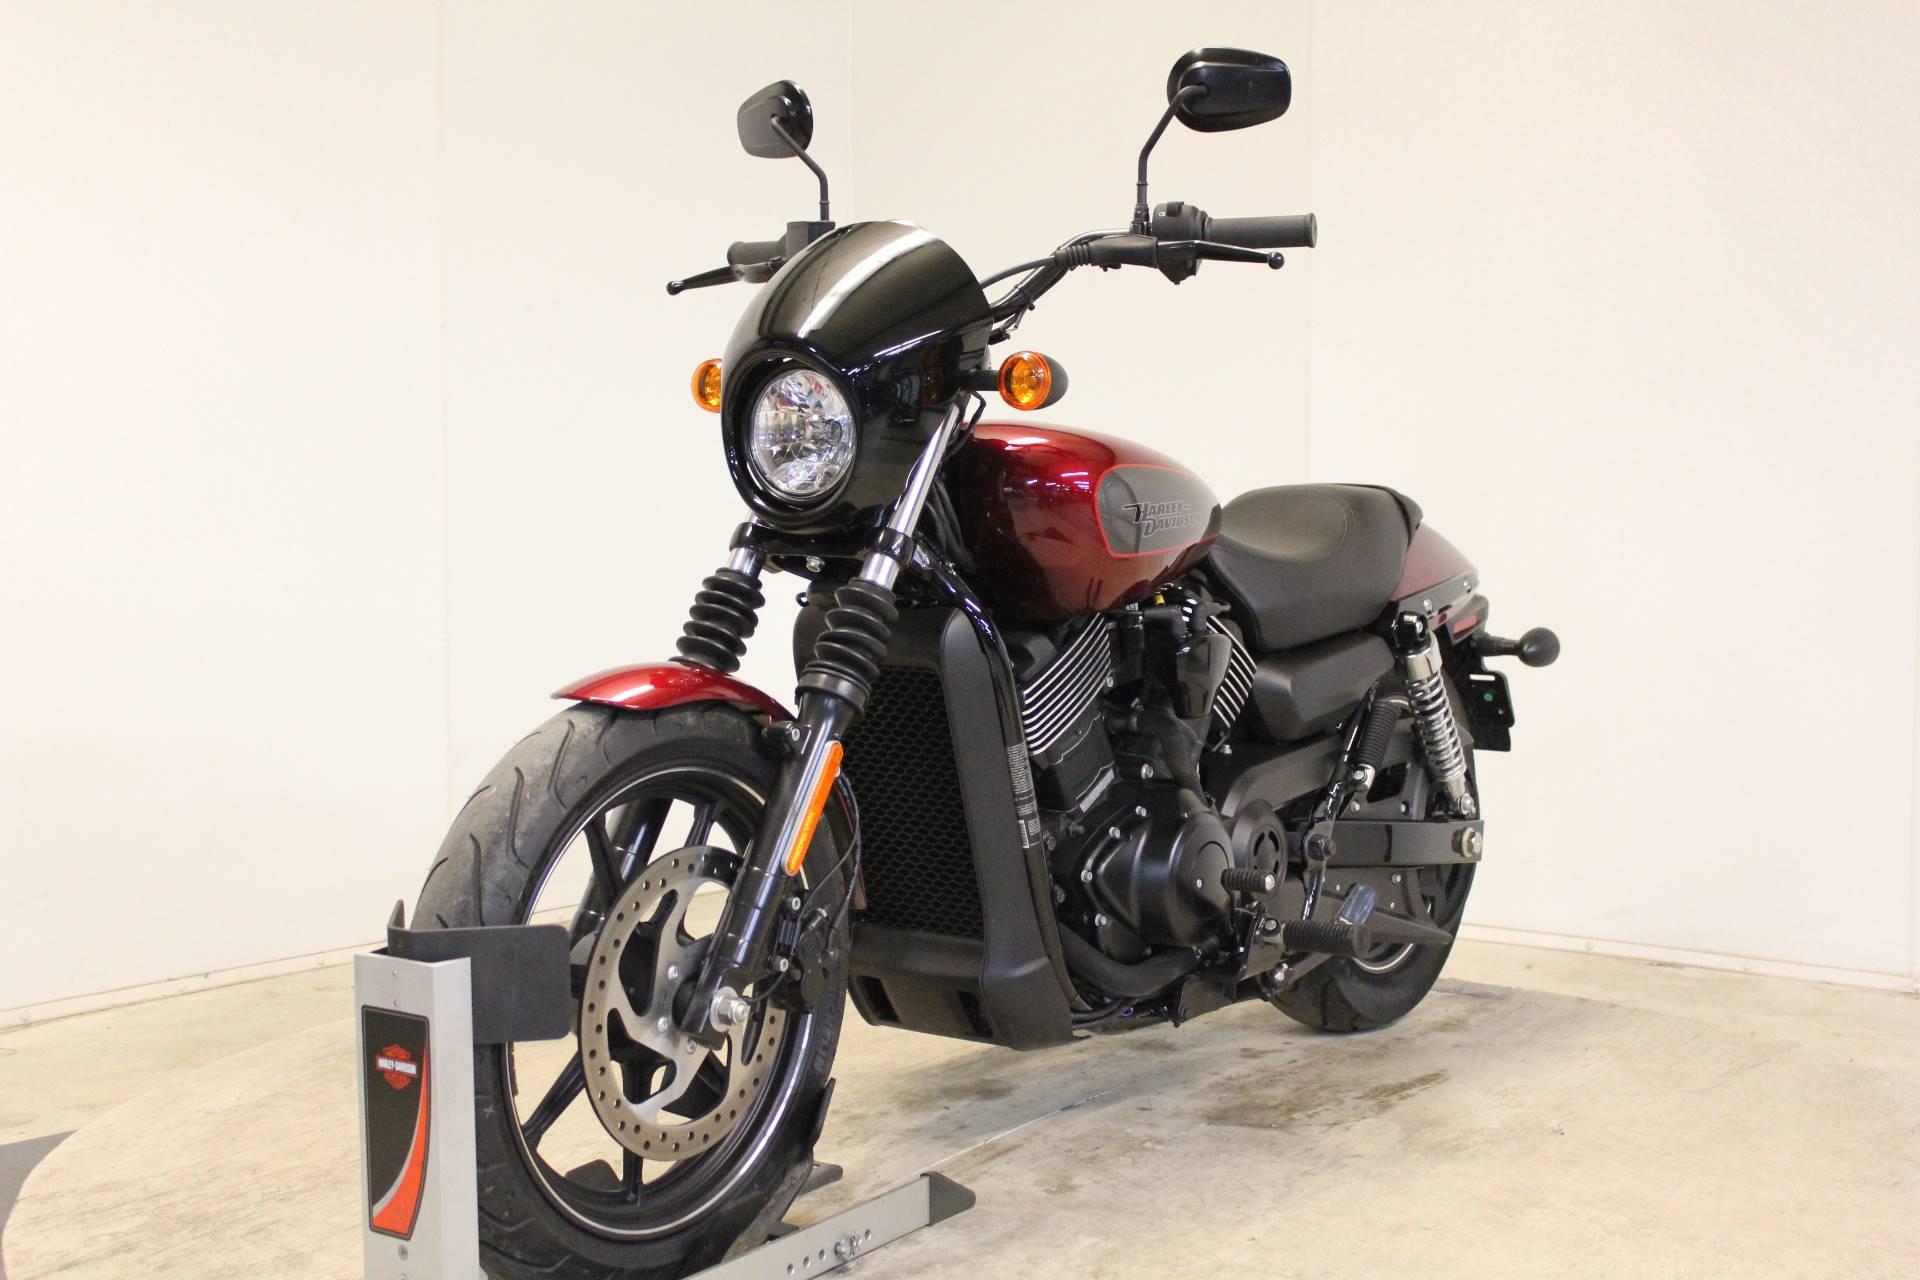 2017 Harley-Davidson Street 750 4